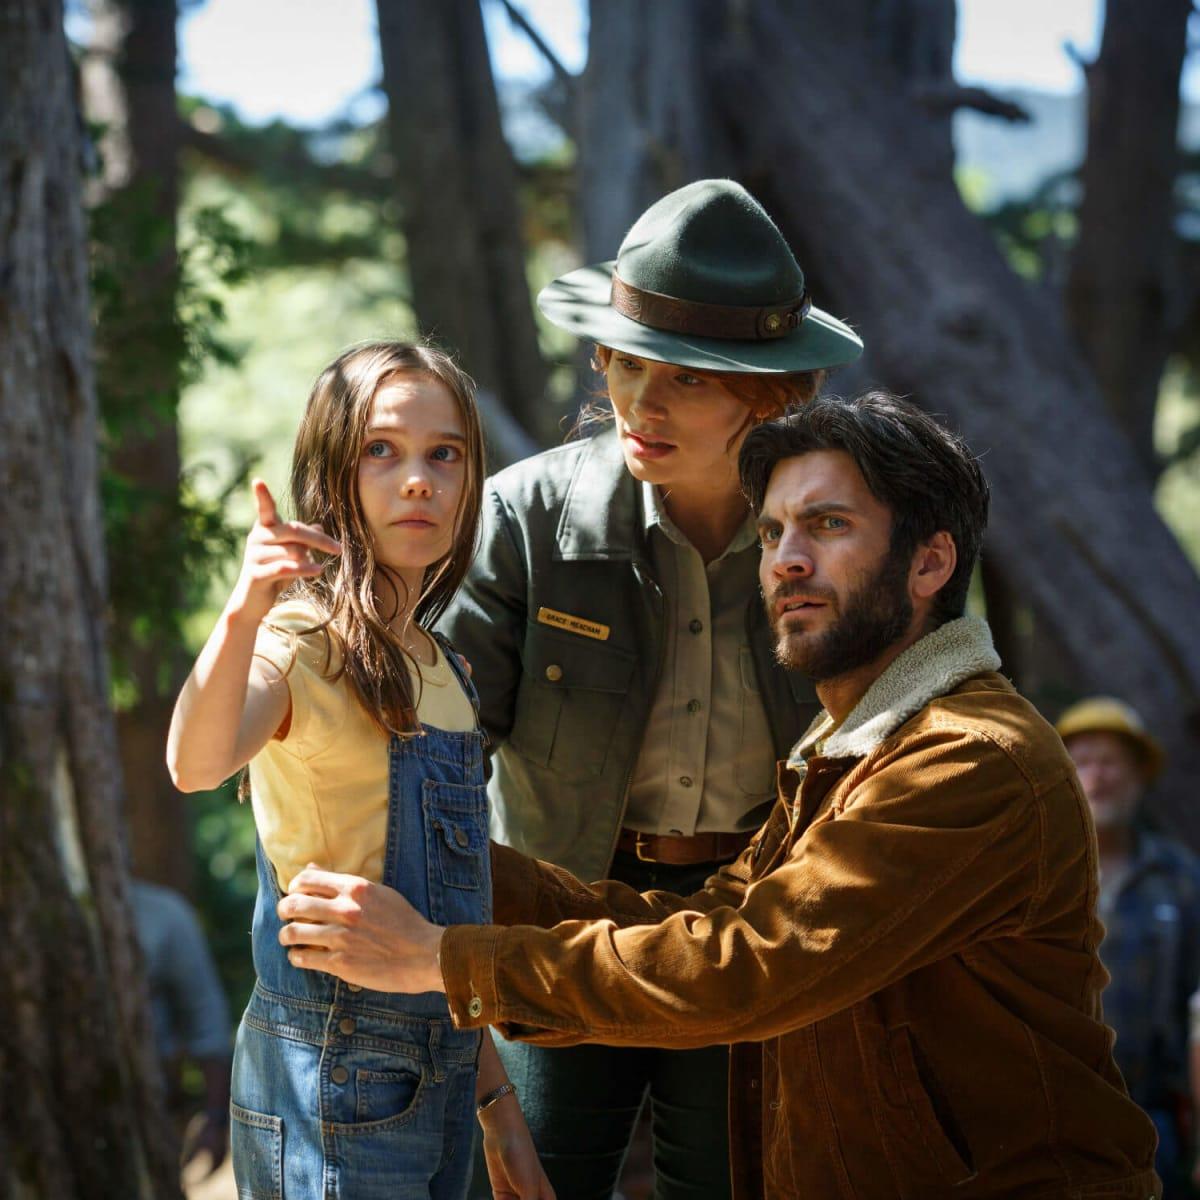 Oona Laurence, Bryce Dallas Howard, and Wes Bentley in Pete's Dragon